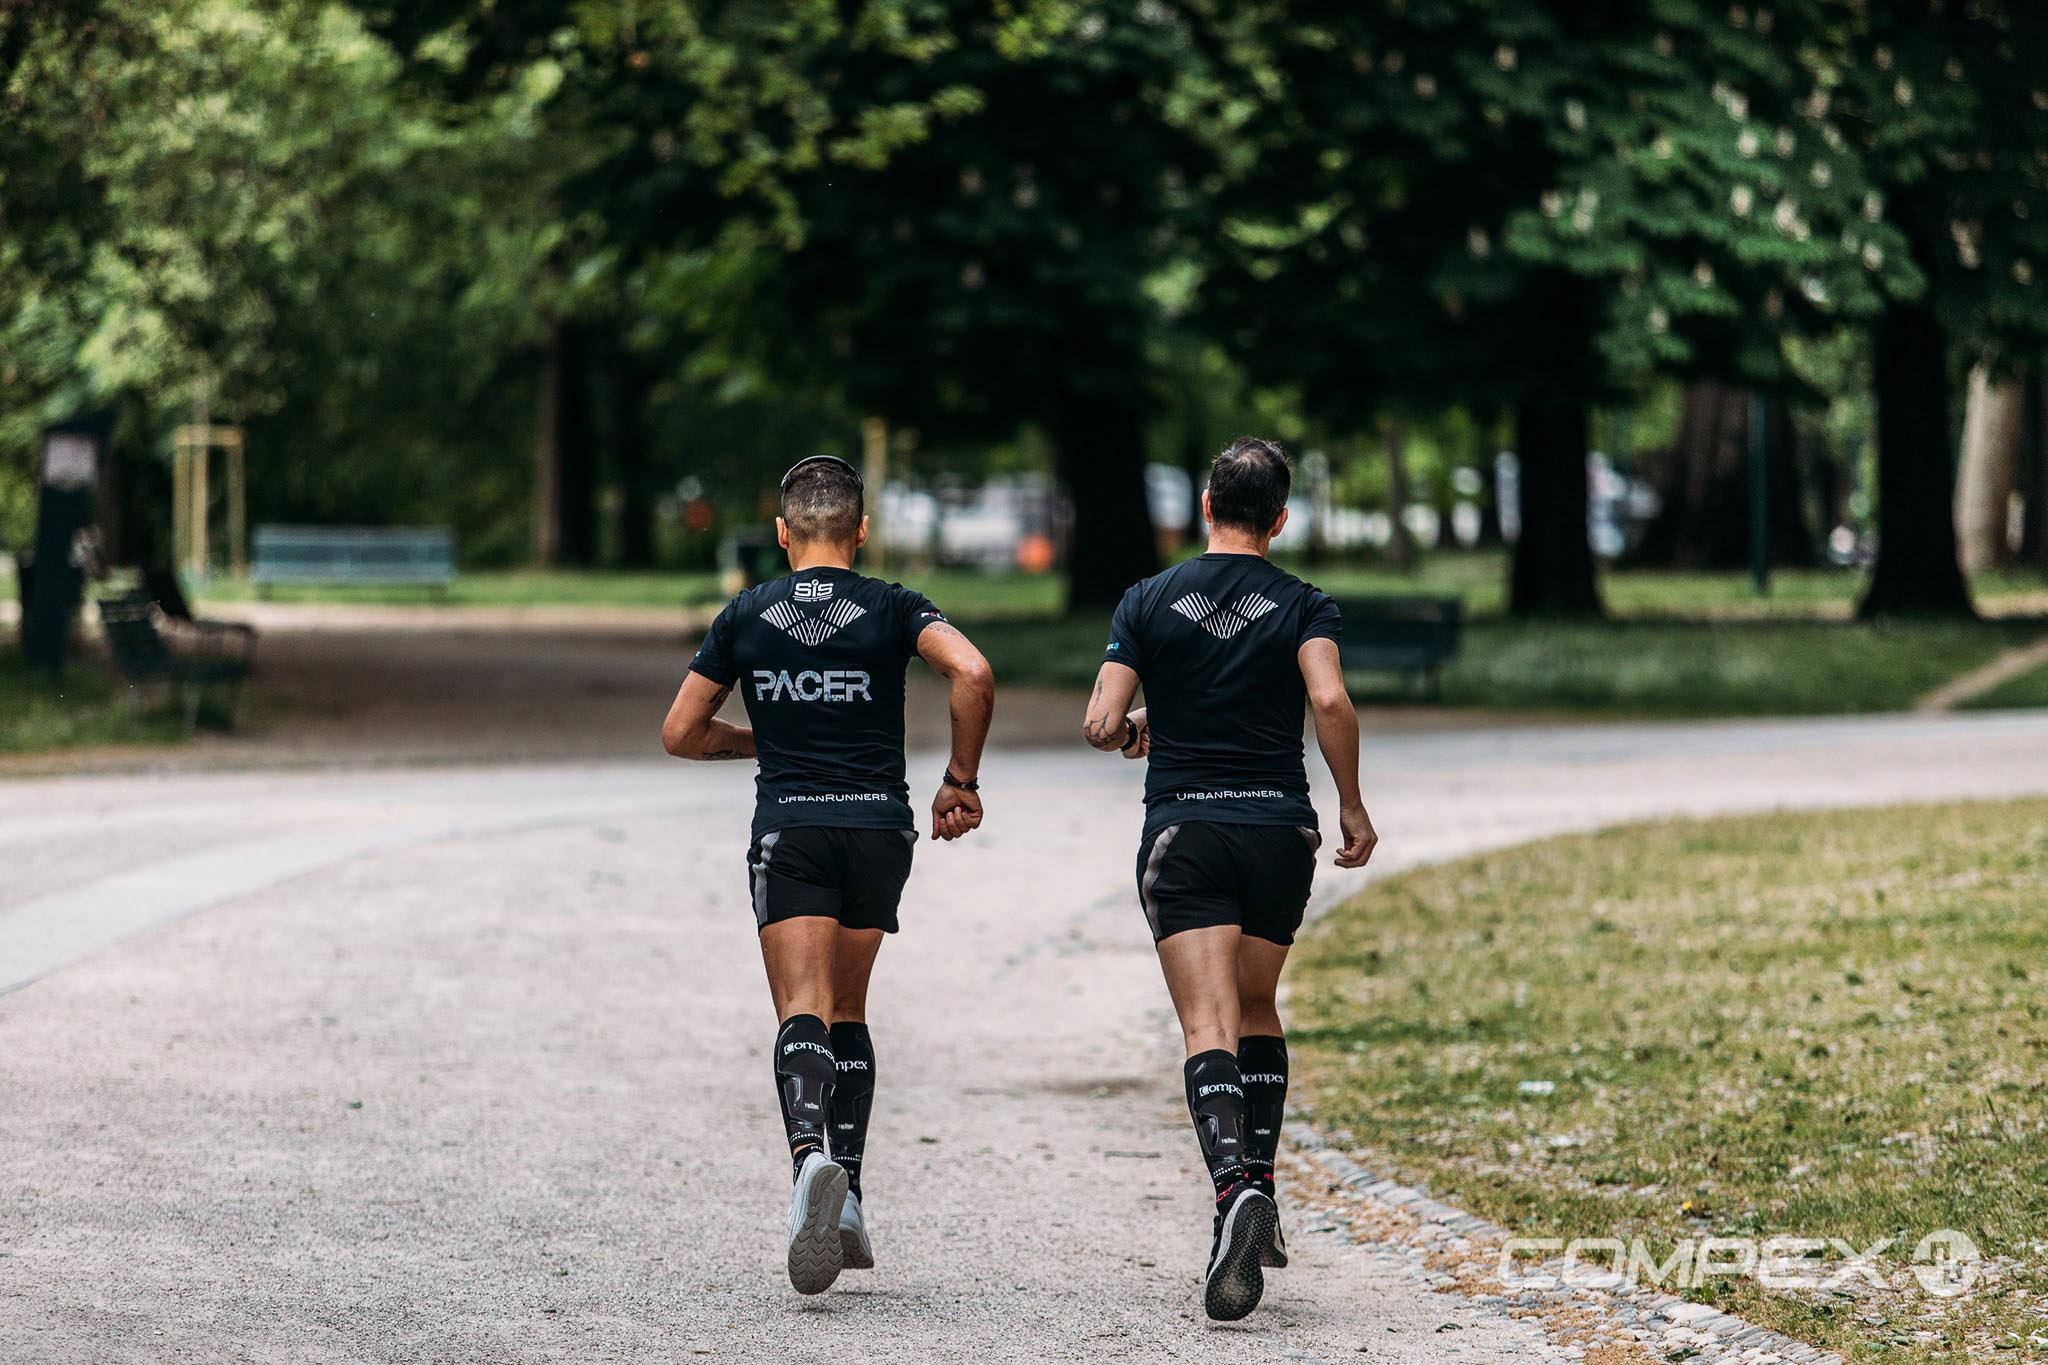 Corri la Milano Marathon 2020 nel Team Compex Italia